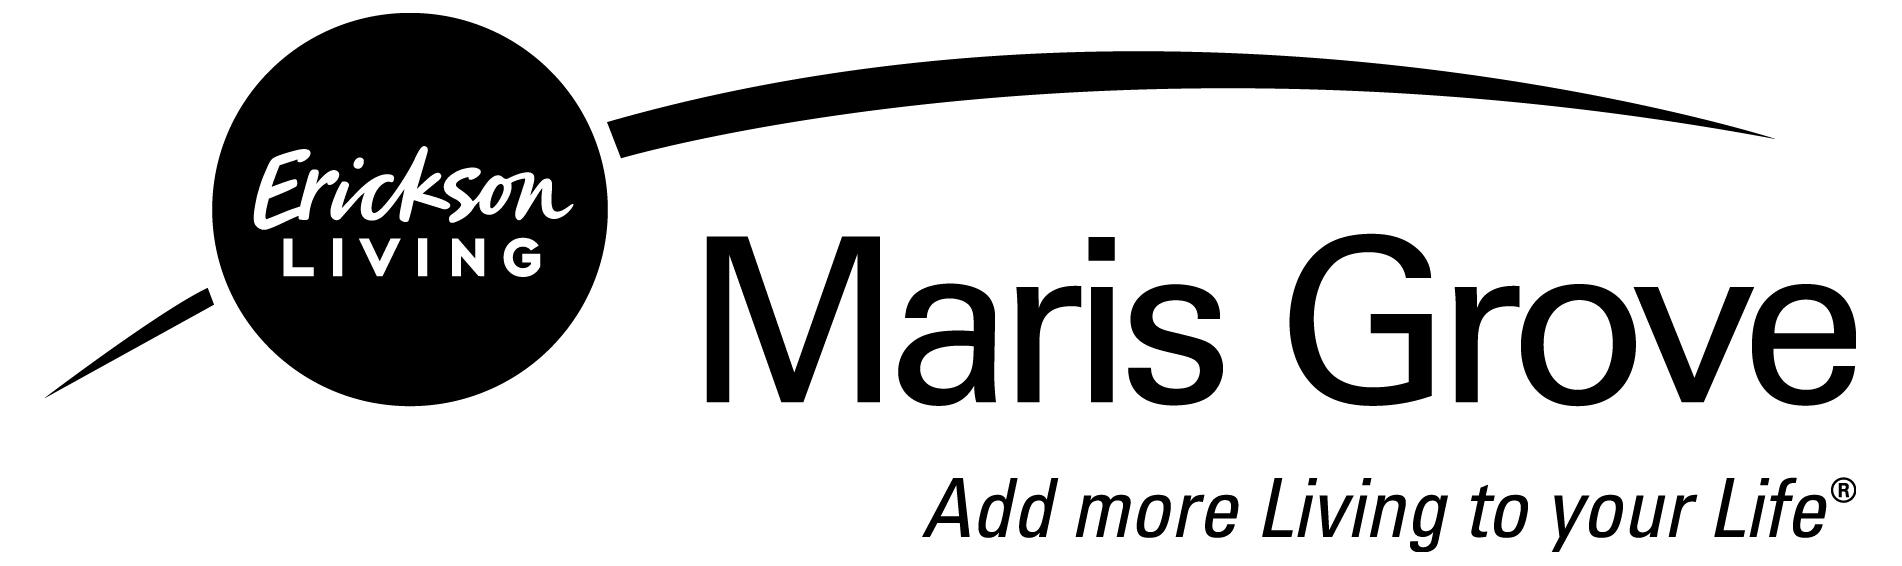 Maris Grove - an Erickson Living Community logo